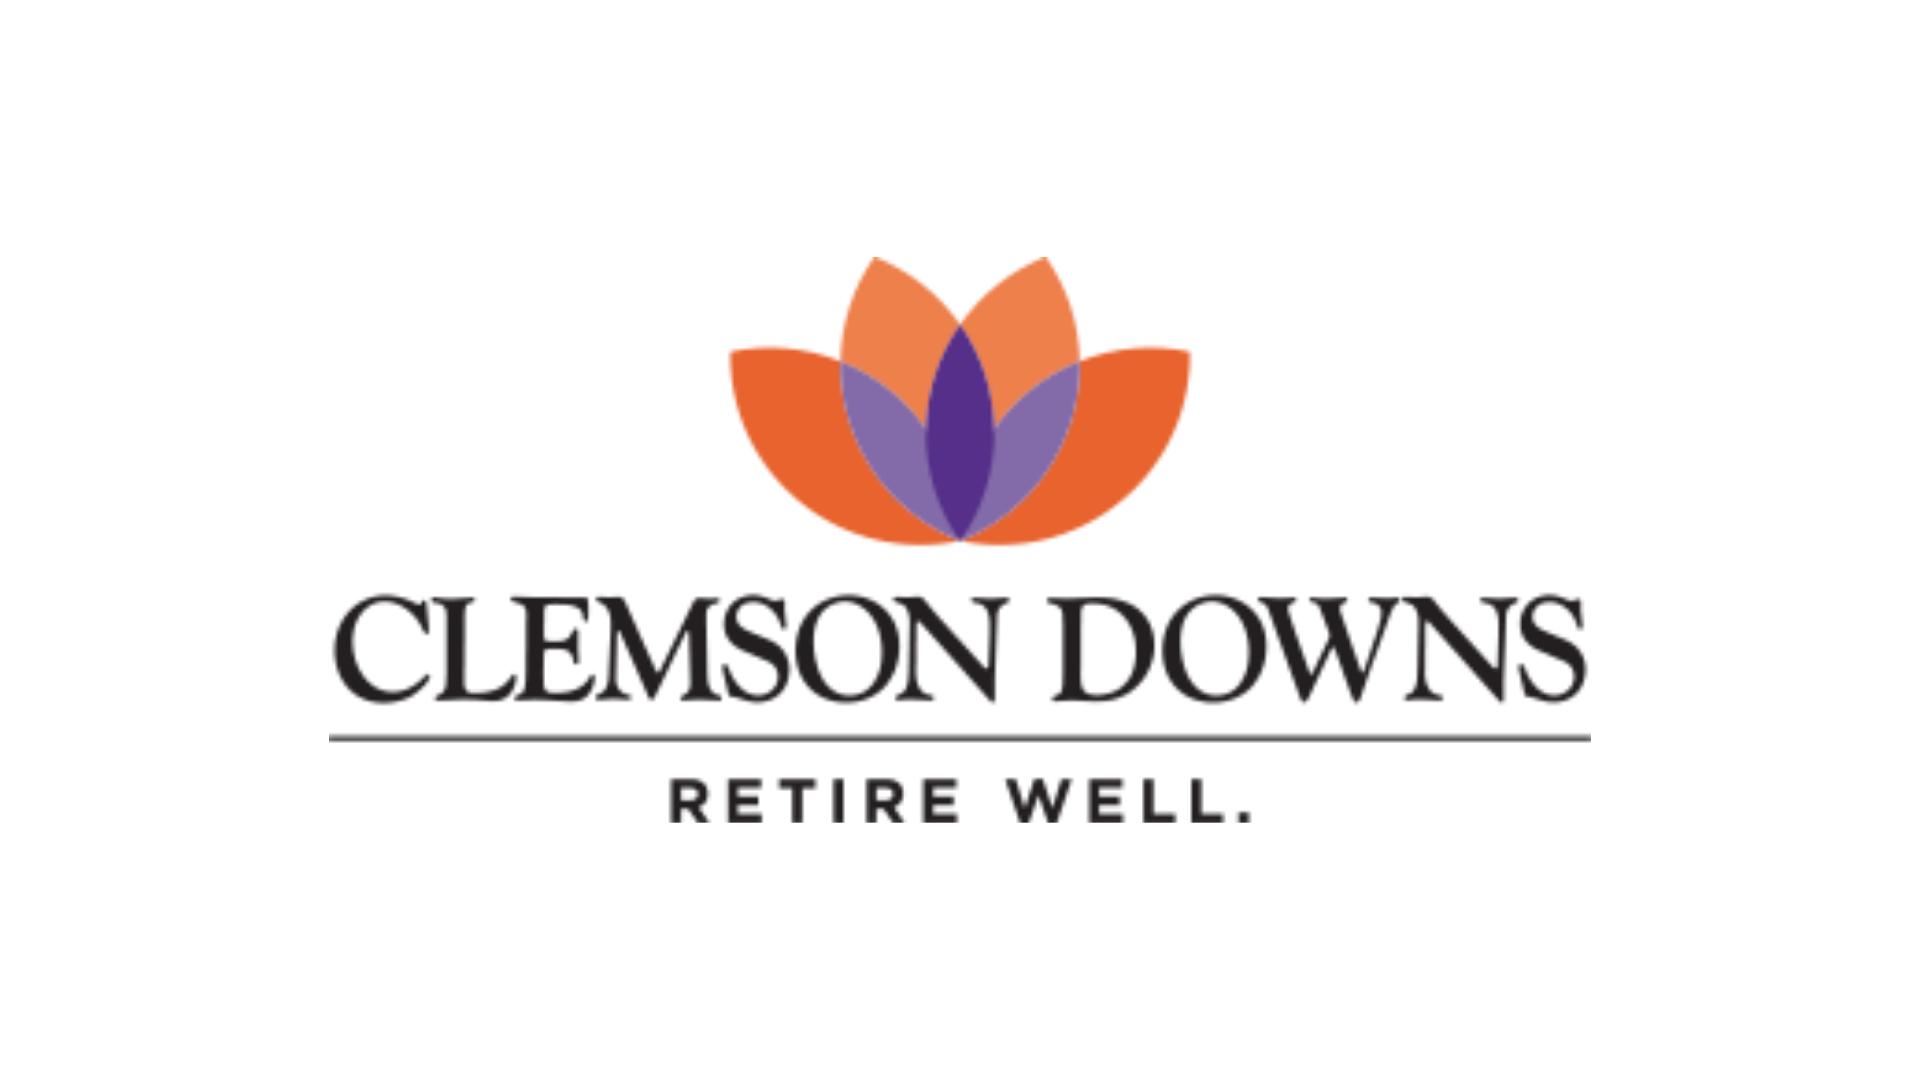 Clemson Downs: Growing census in senior living